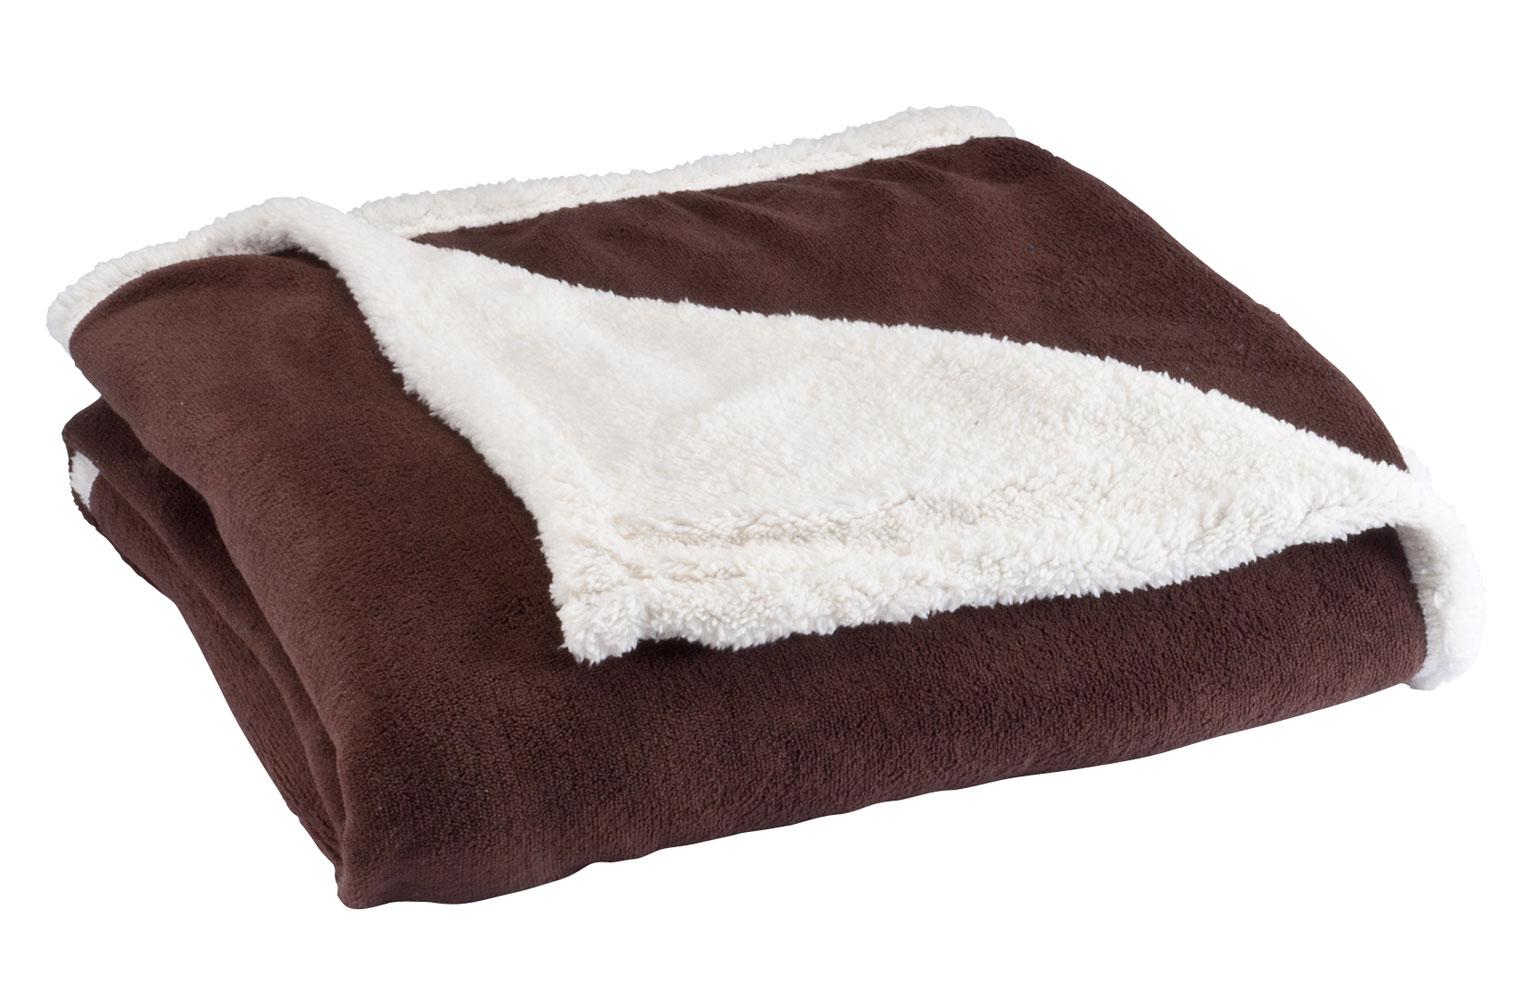 Ultra plush microfiber sherpa throw by oakridgetm ebay for Sherpa blanket